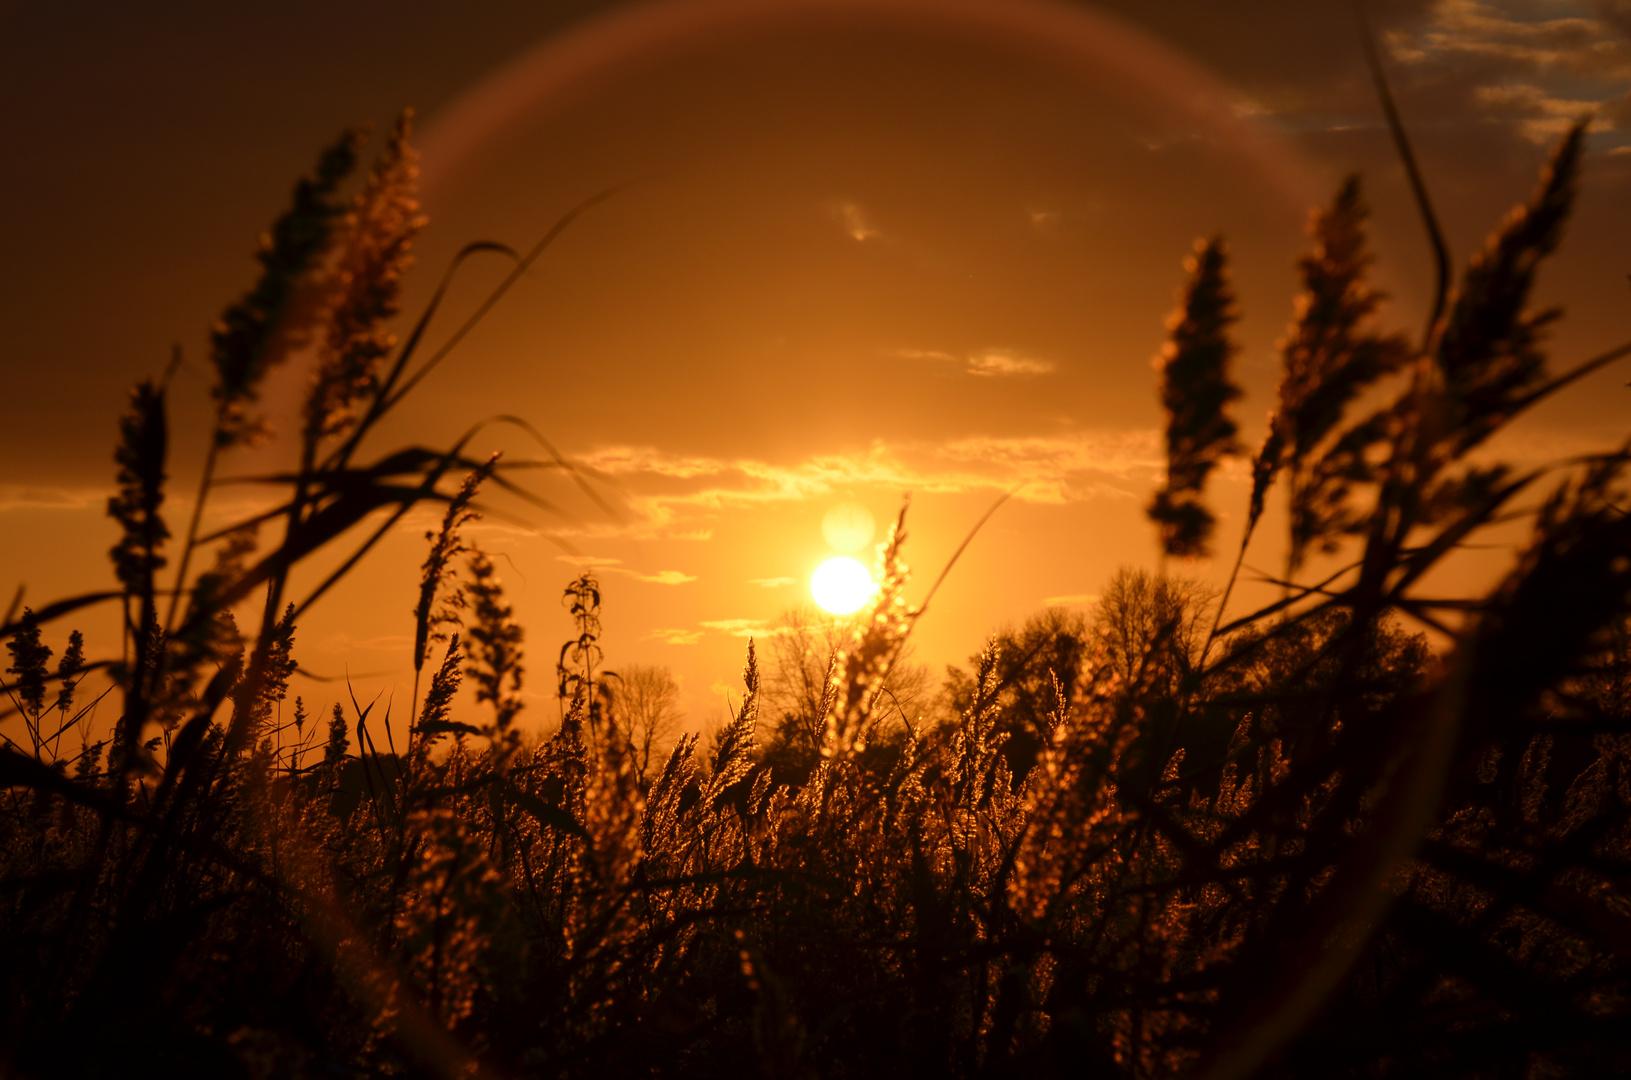 Sonnenuntergang im Schilf II